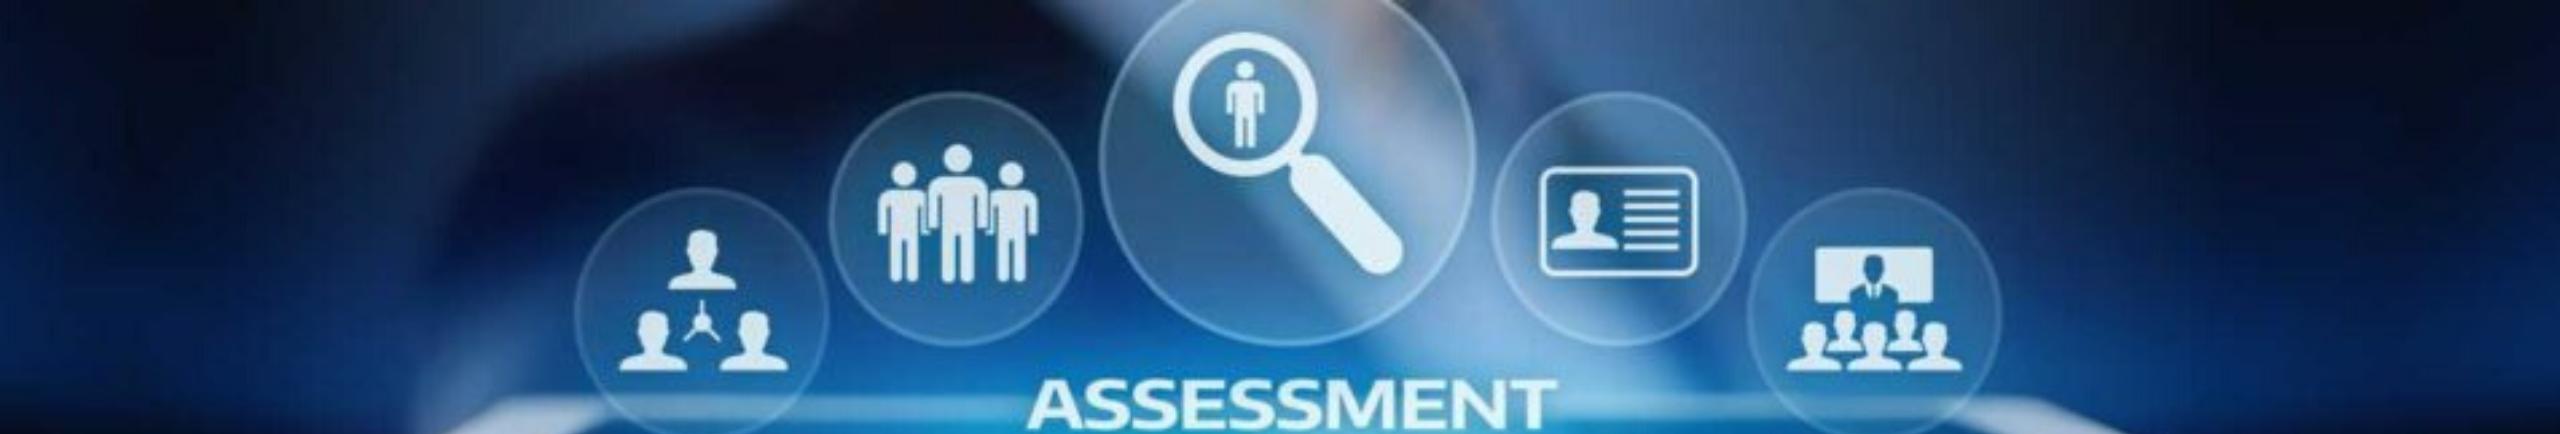 Assessment Potenzialanalyse